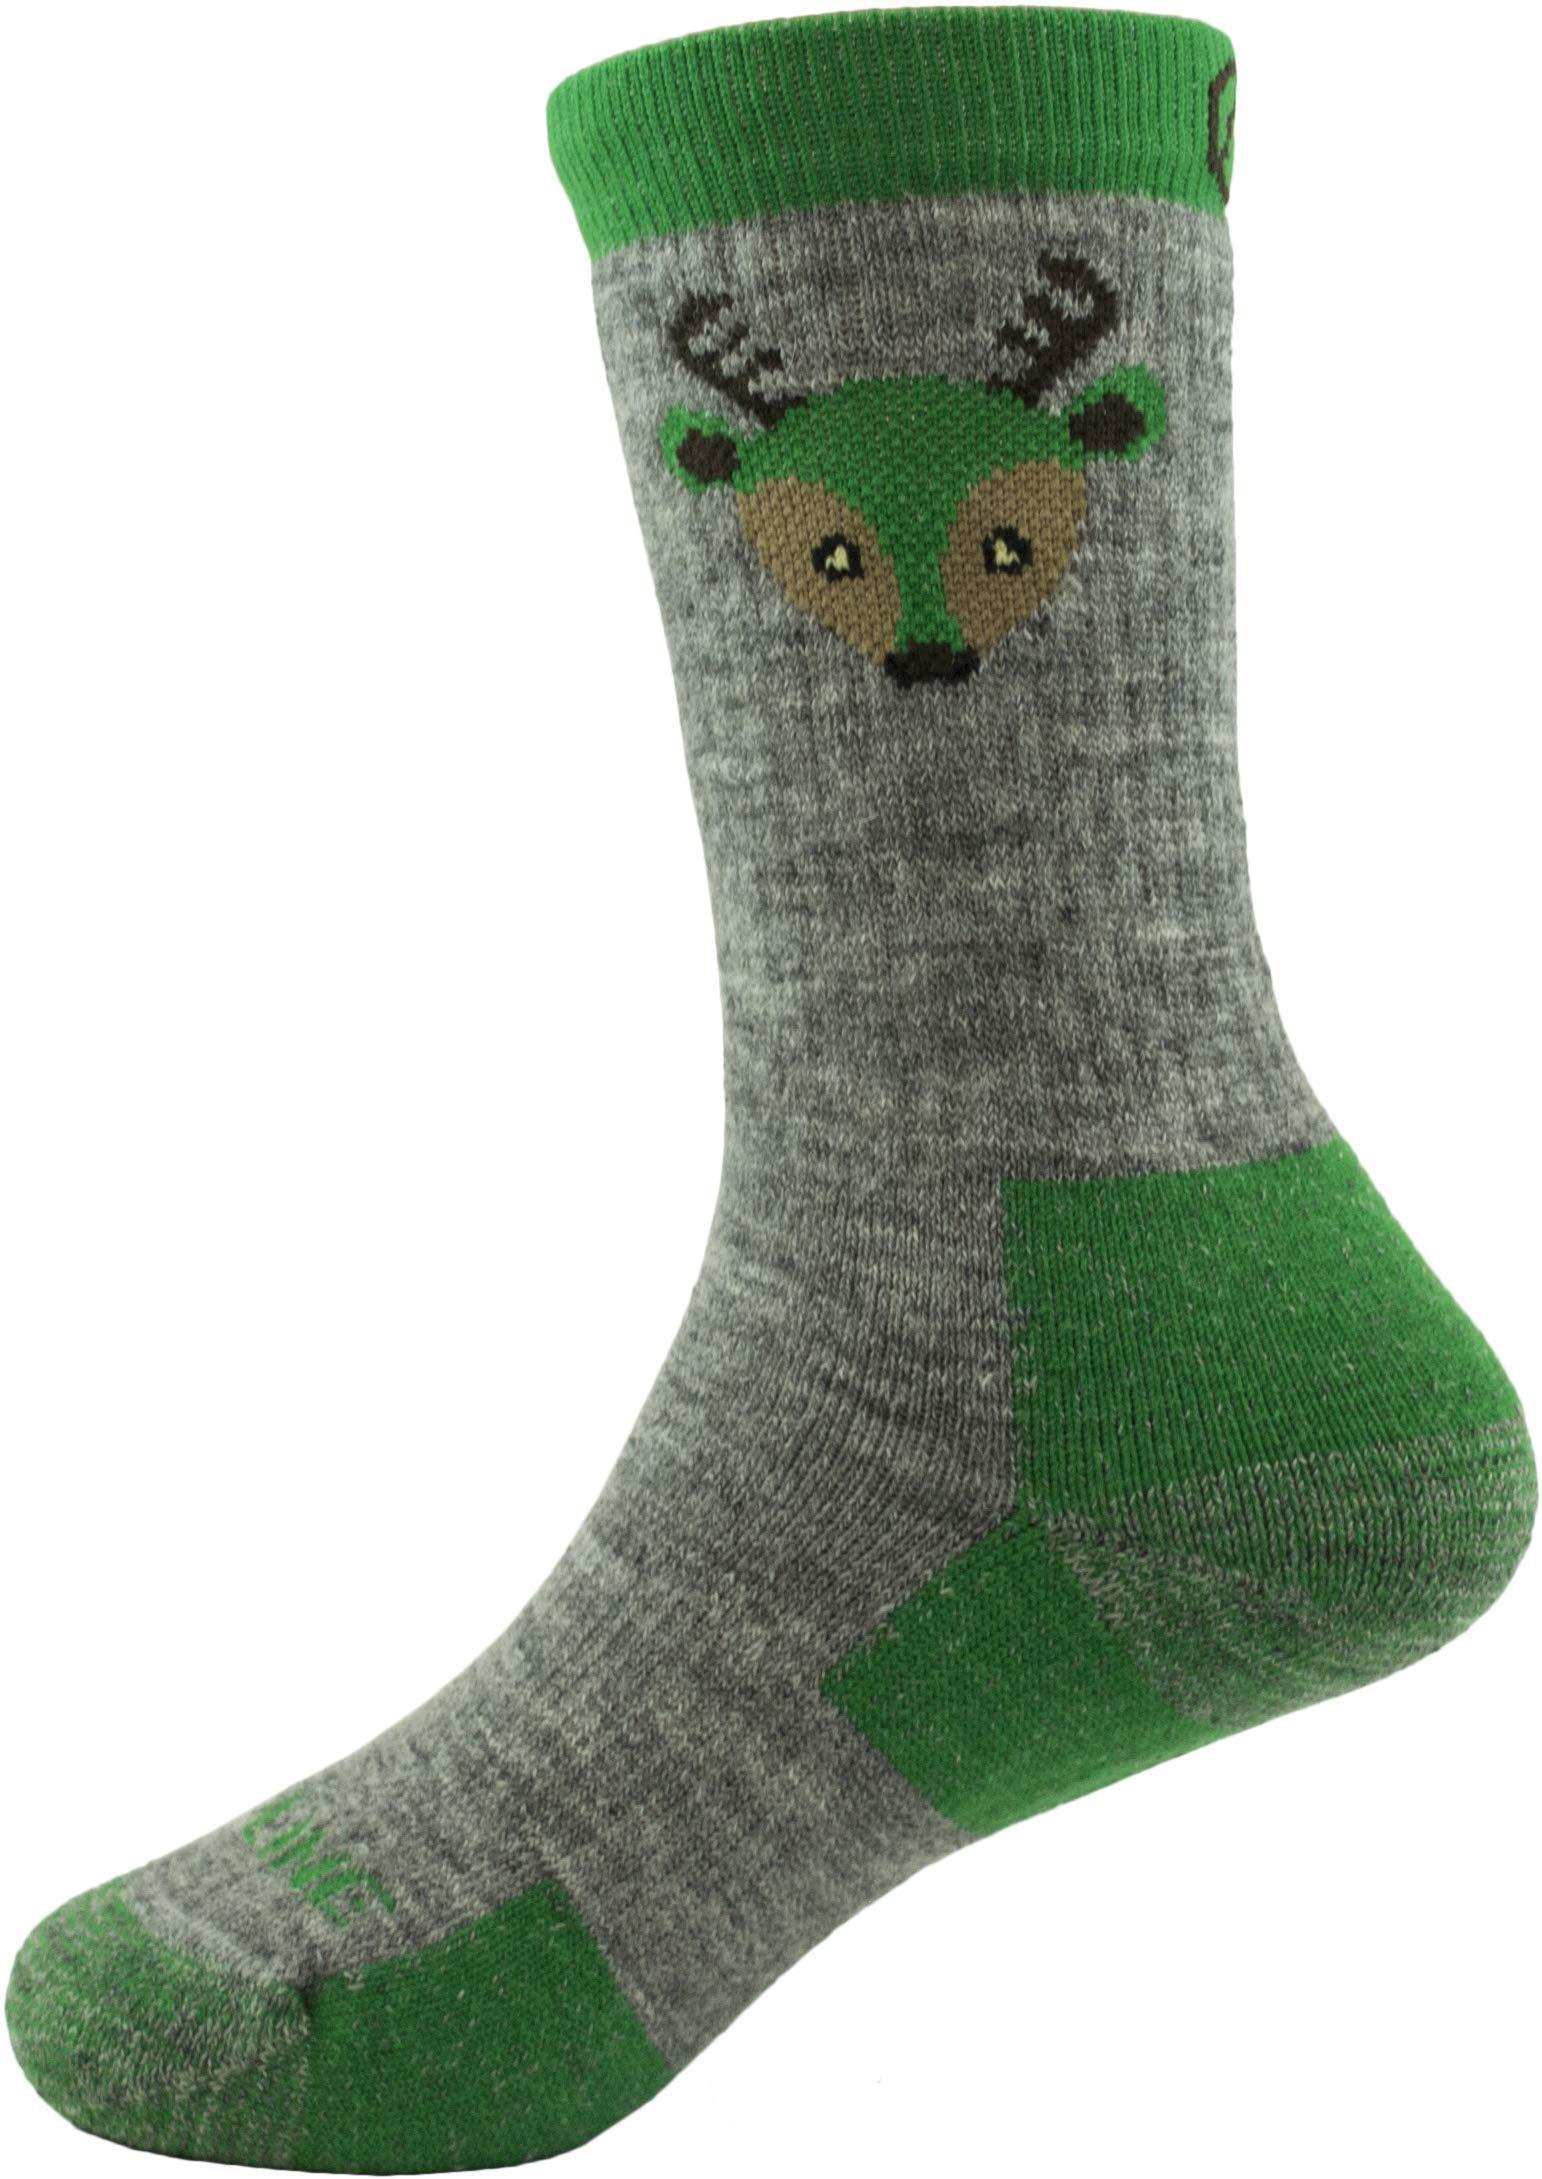 CloudLine Merino Wool Kid's Spirit Animal Socks - 2 Pack Green Deer - Size Y-XS - Made in USA